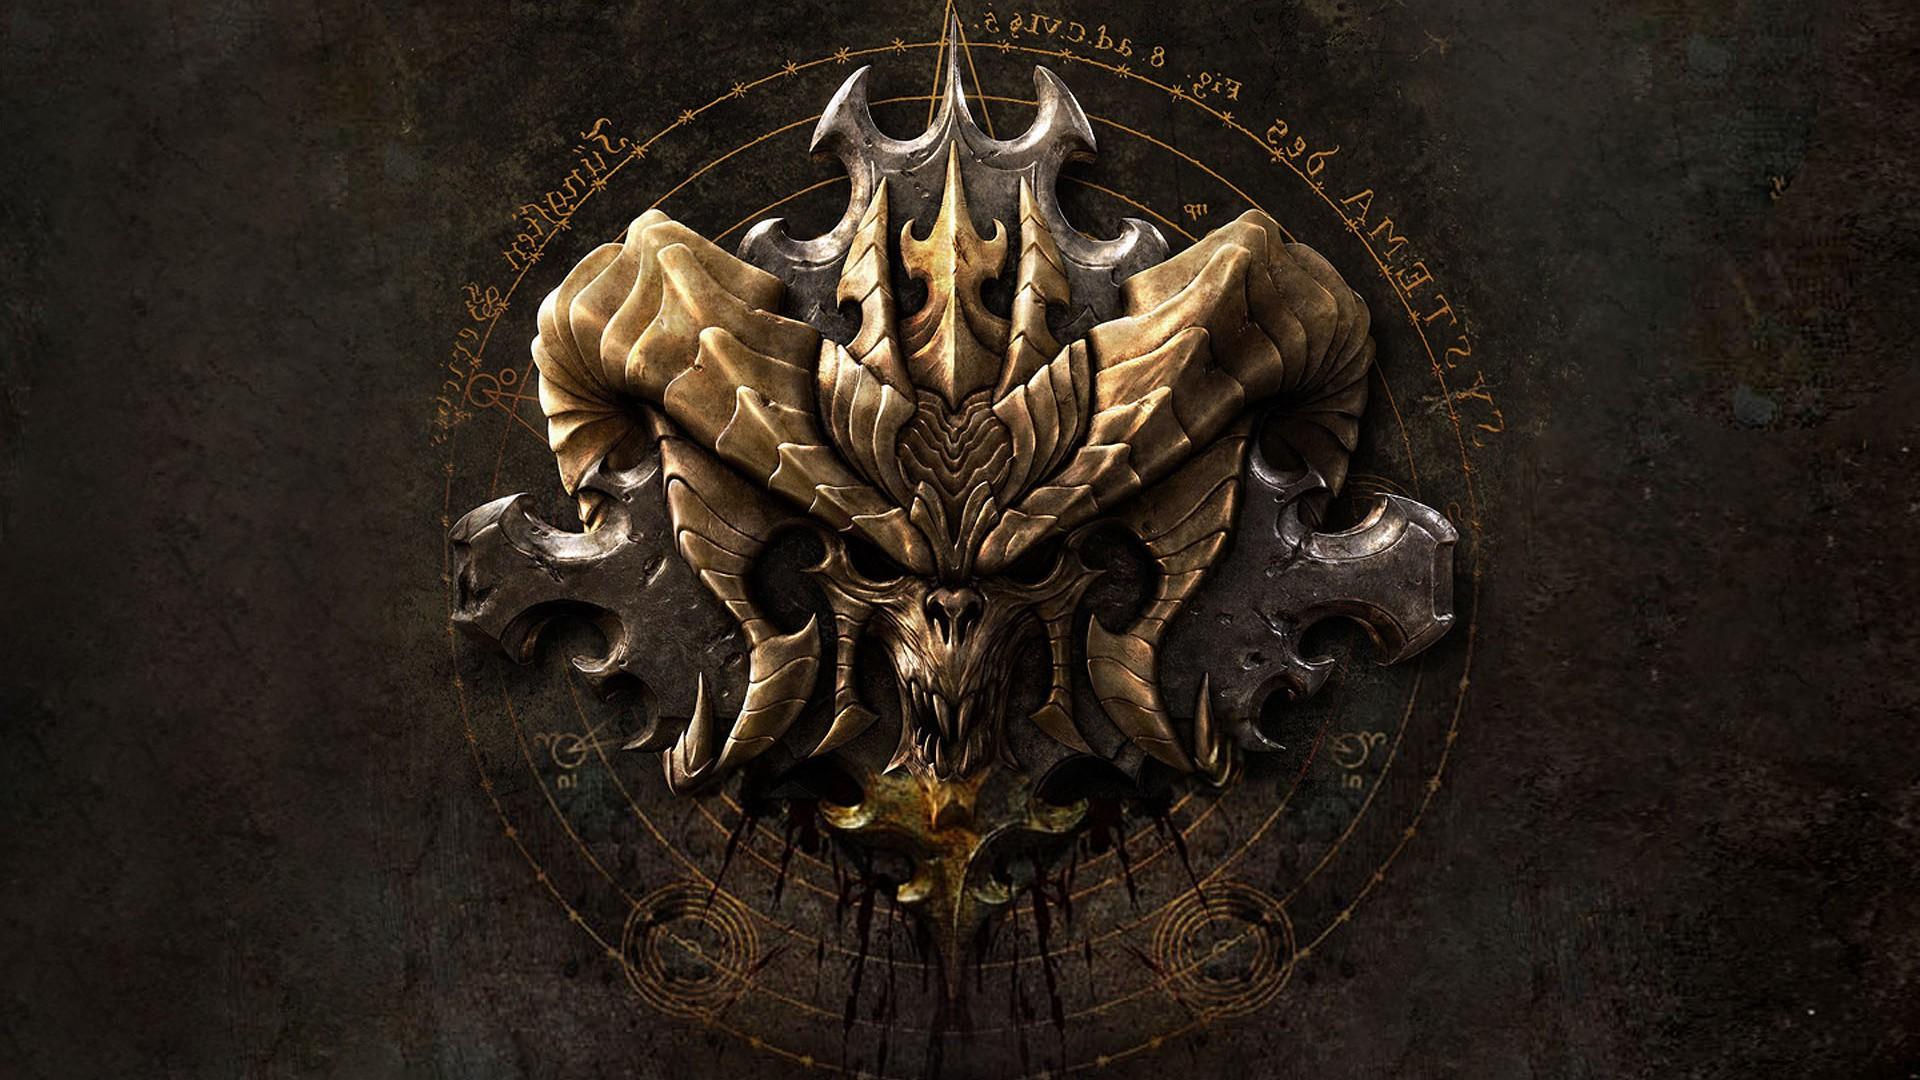 Fondos De Pantalla Videojuegos Escultura Estatua Diablo